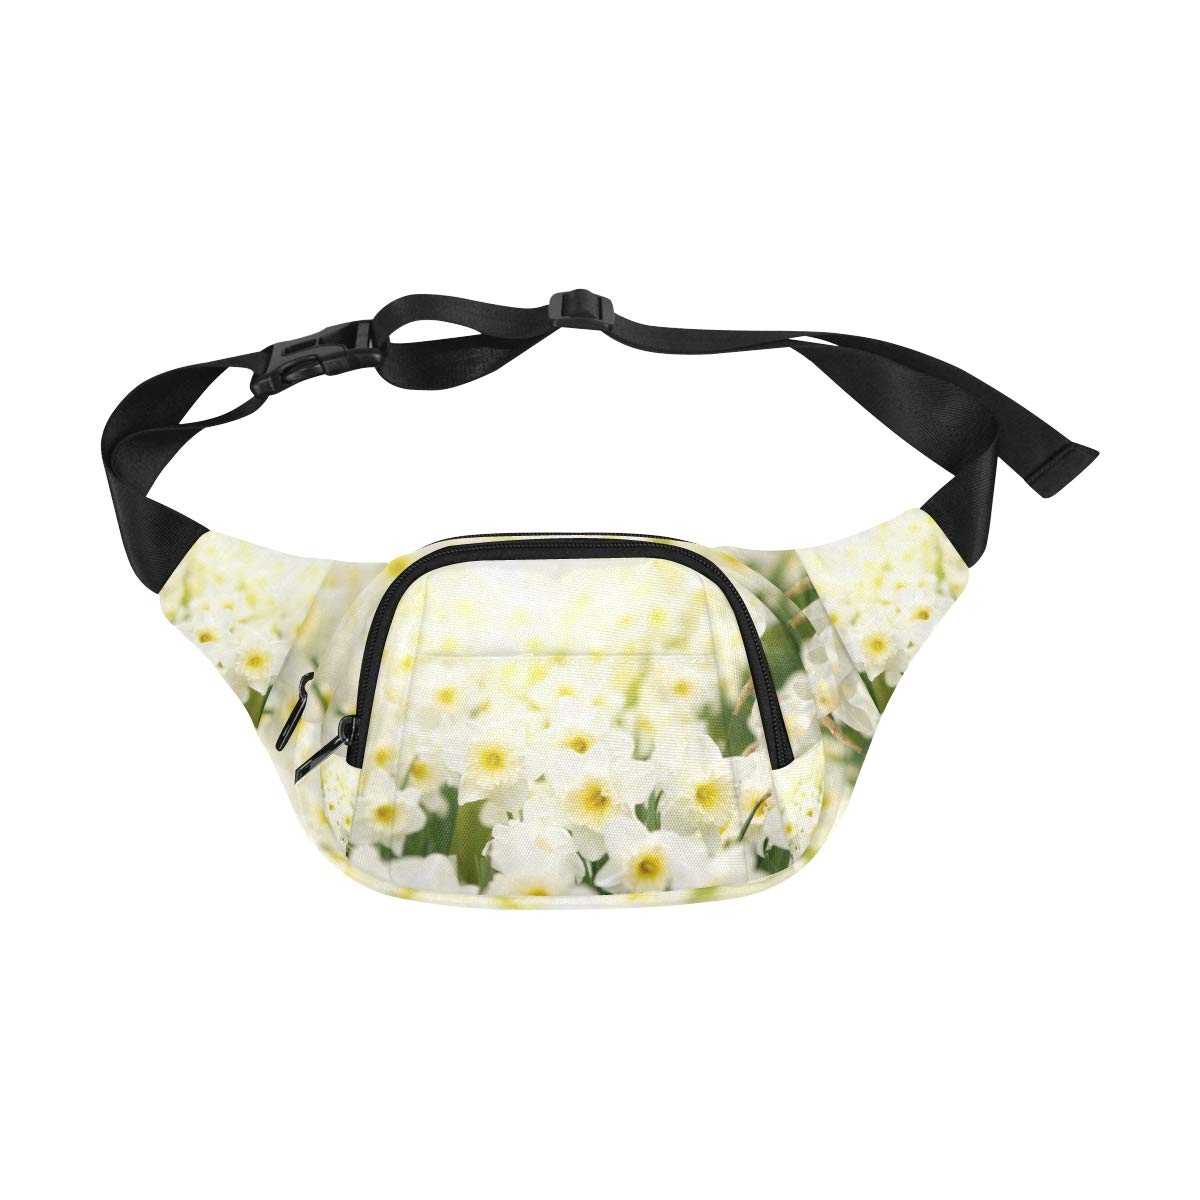 Beautiful White Daffodil Flower Fenny Packs Waist Bags Adjustable Belt Waterproof Nylon Travel Running Sport Vacation Party For Men Women Boys Girls Kids